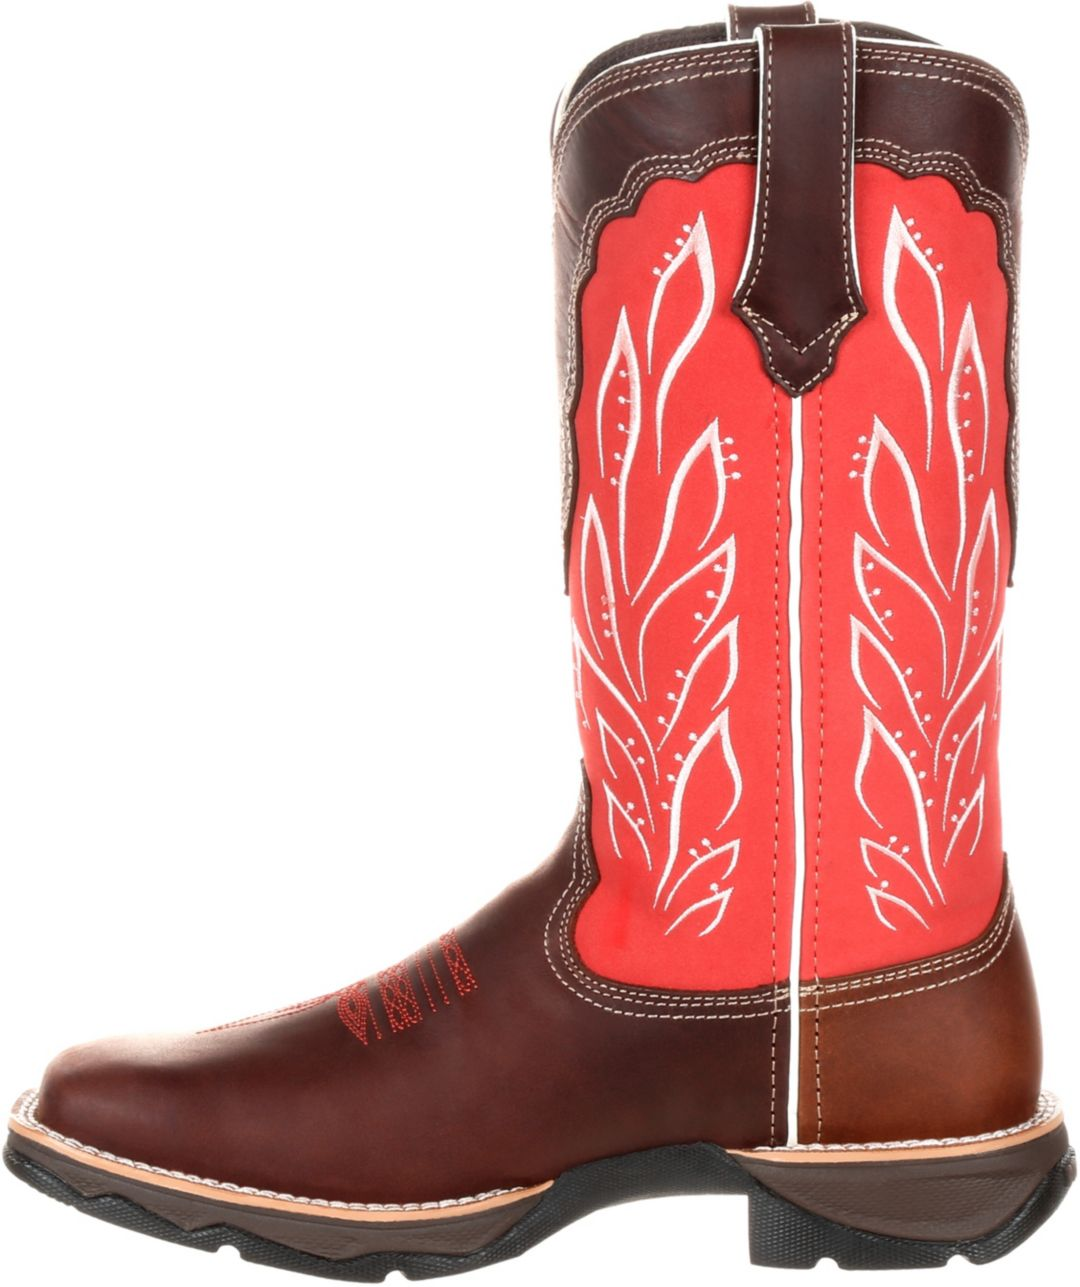 b79fbe65f90 Durango Women's Lady Rebel Strawberry Sunrise Western Work Boots